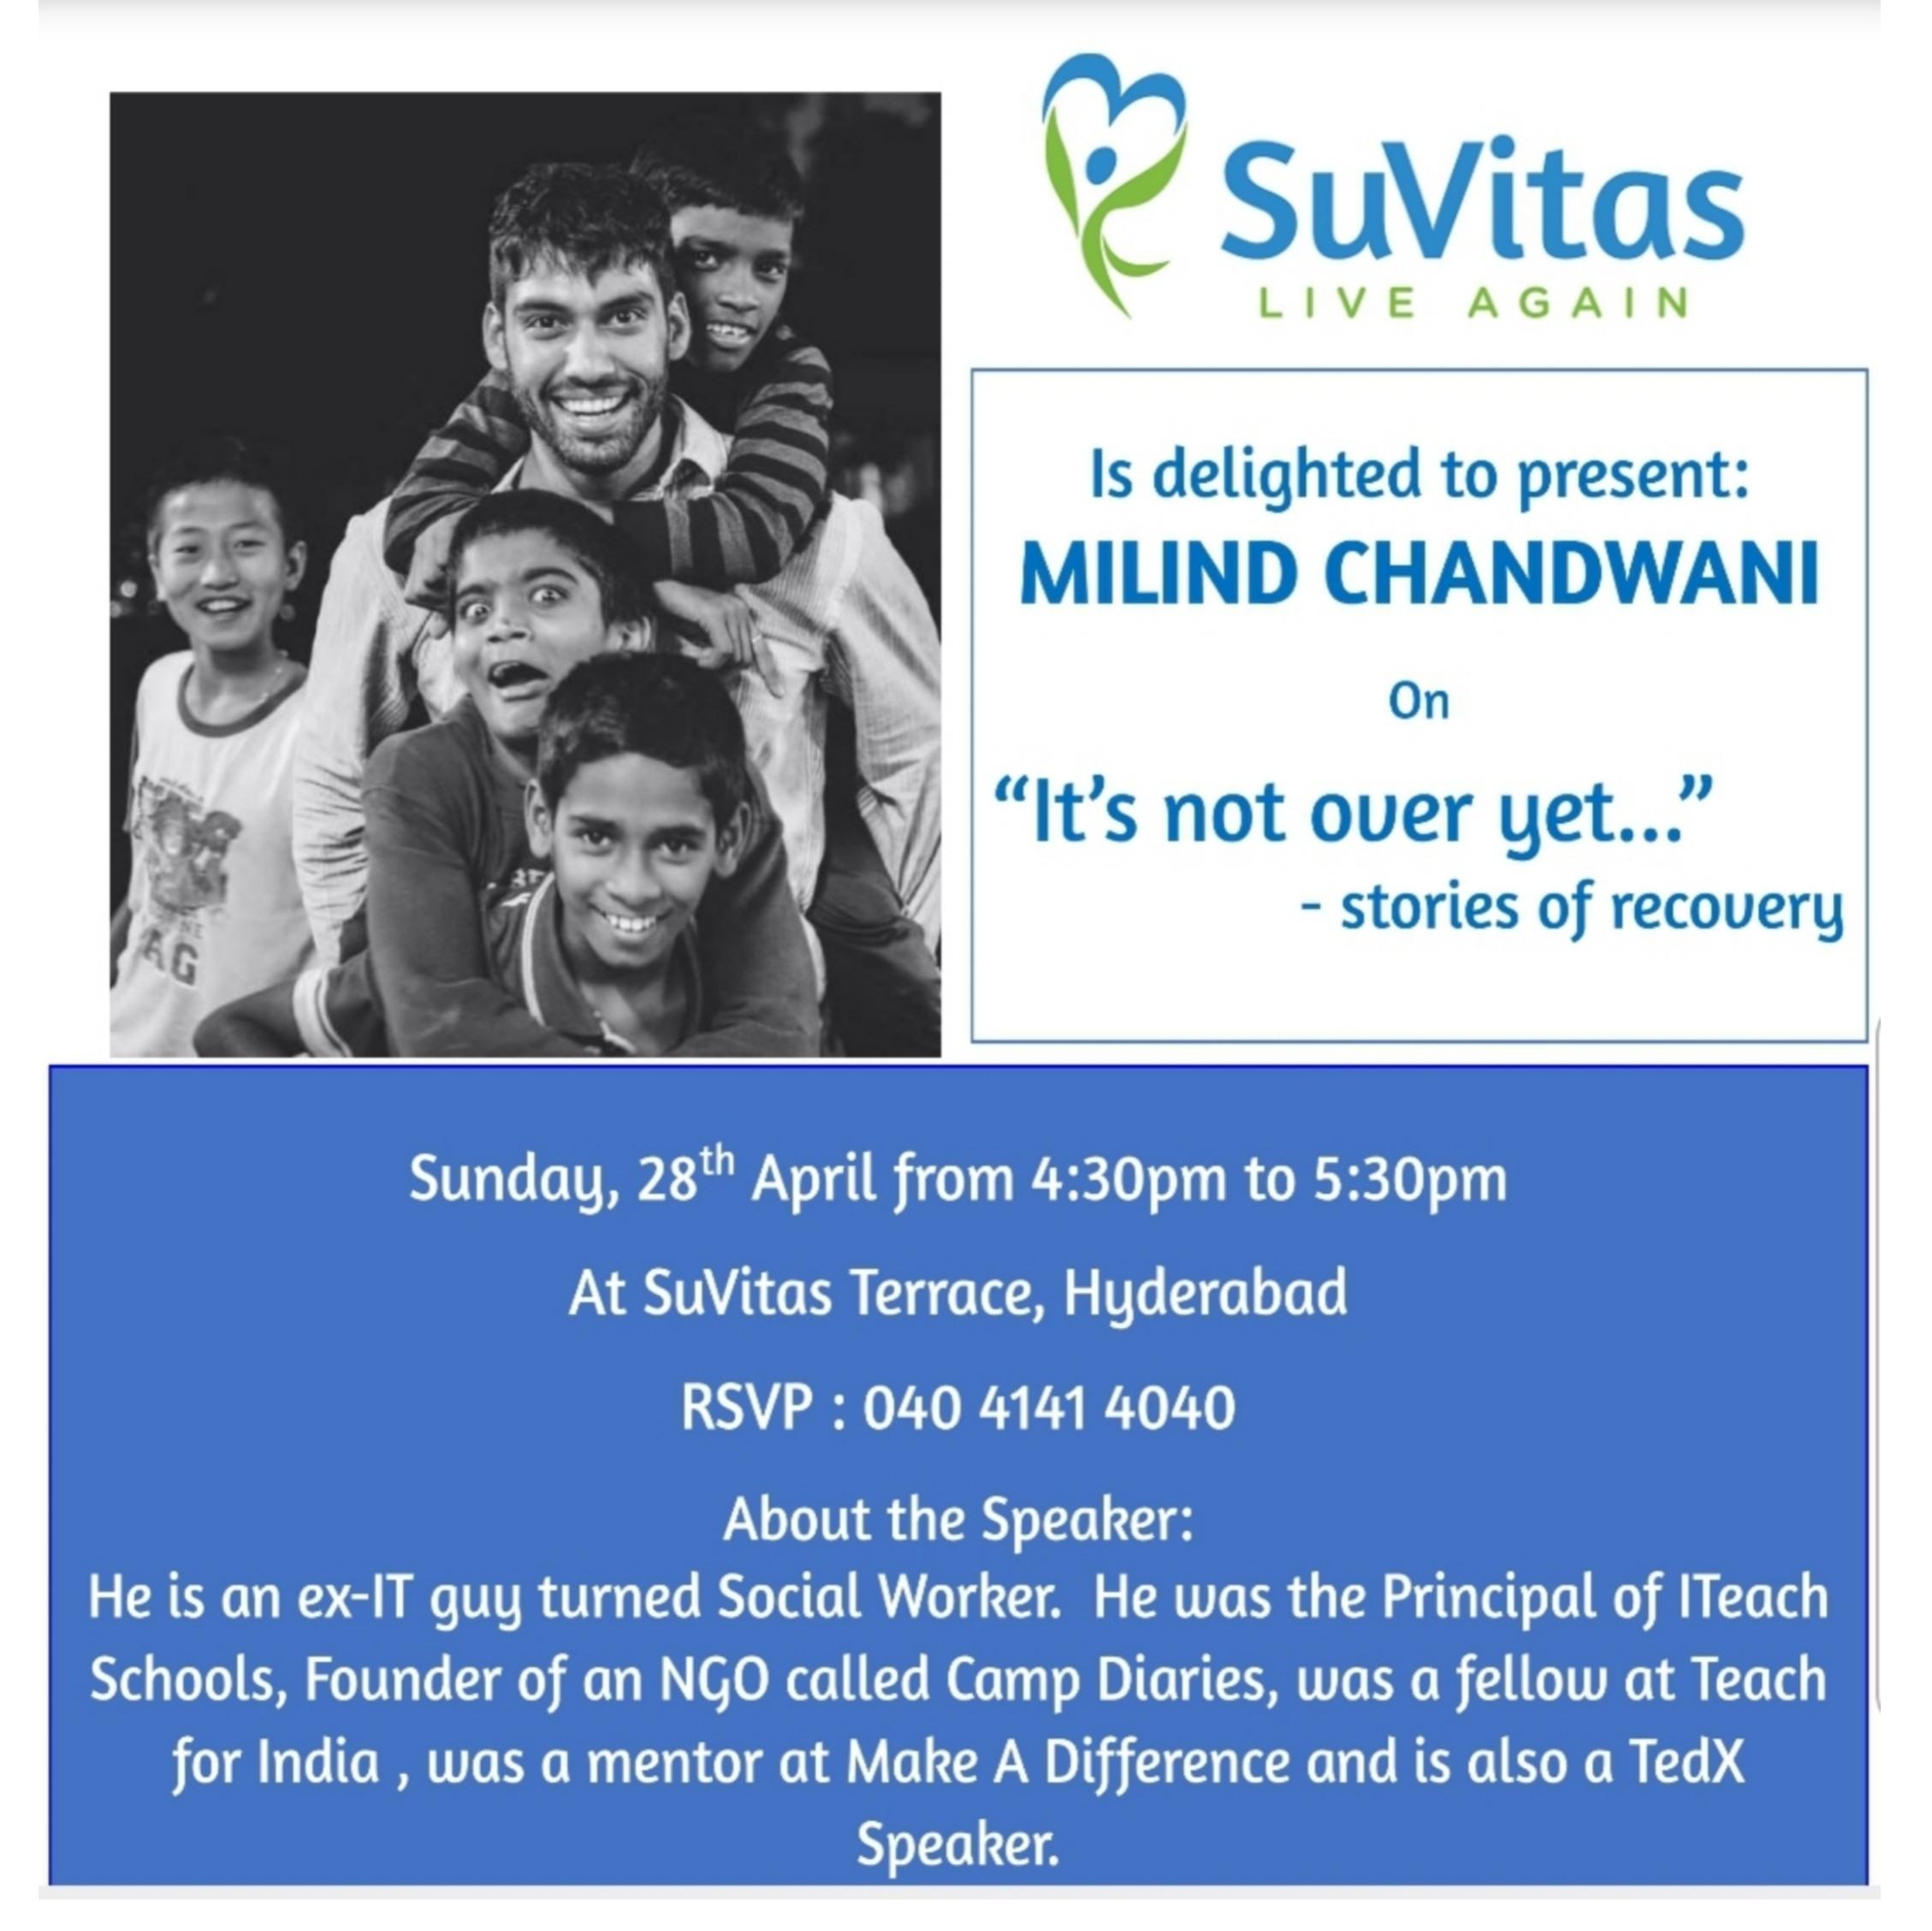 Sundays@SuVitas - Milind Chandwani